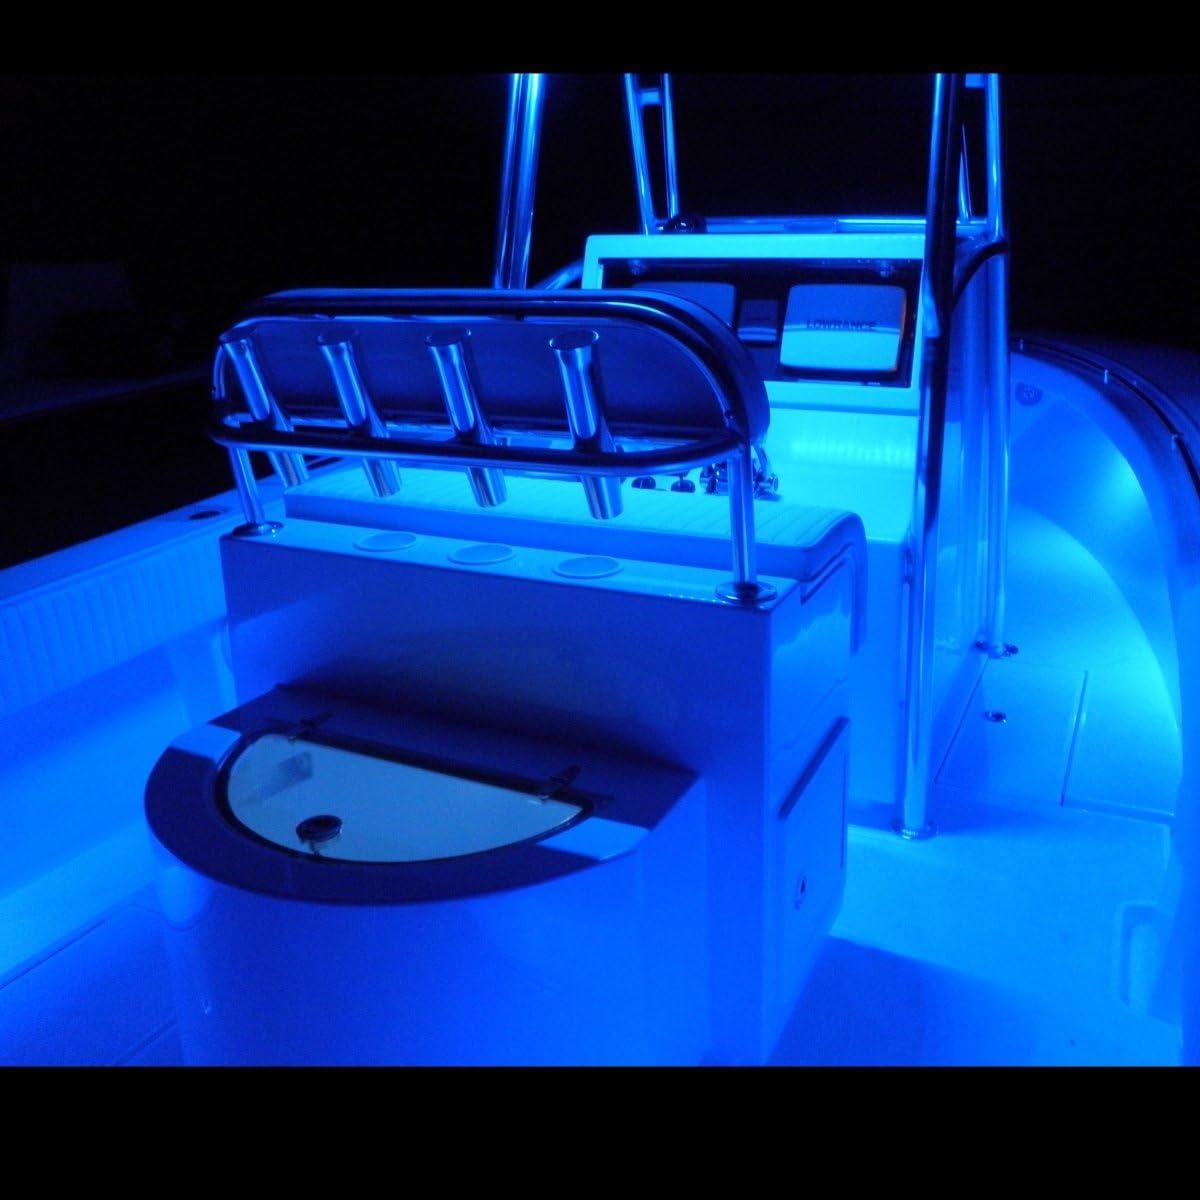 MarineLED Blue Boat Waterproof LED Under Gunnel Lights 12V Flexible Cuttable 16ft Bright2